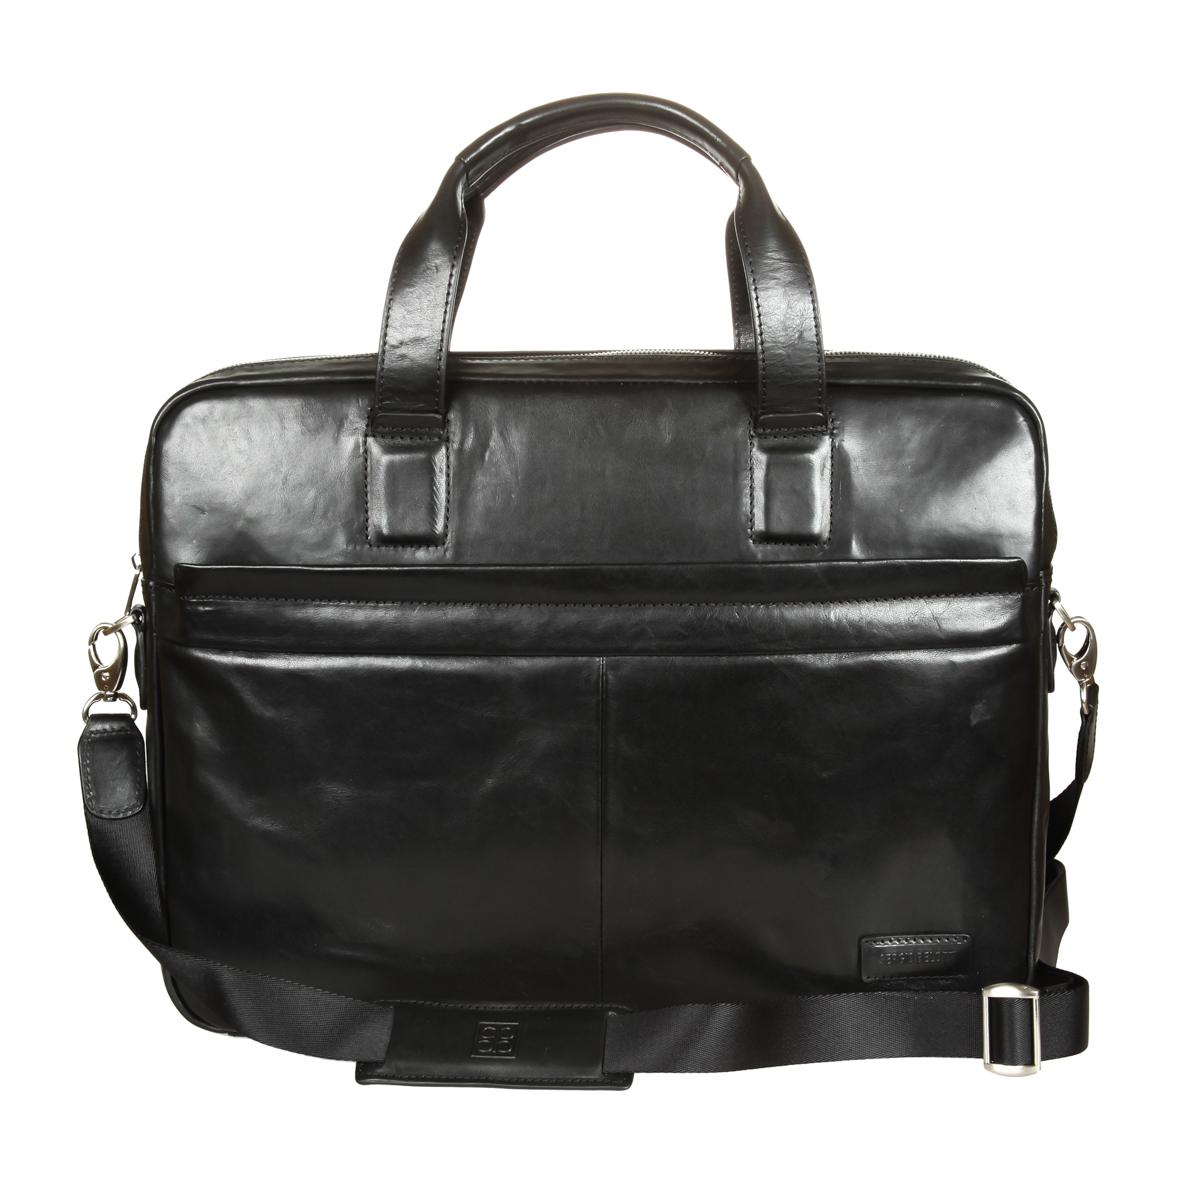 универсальная мужская сумка